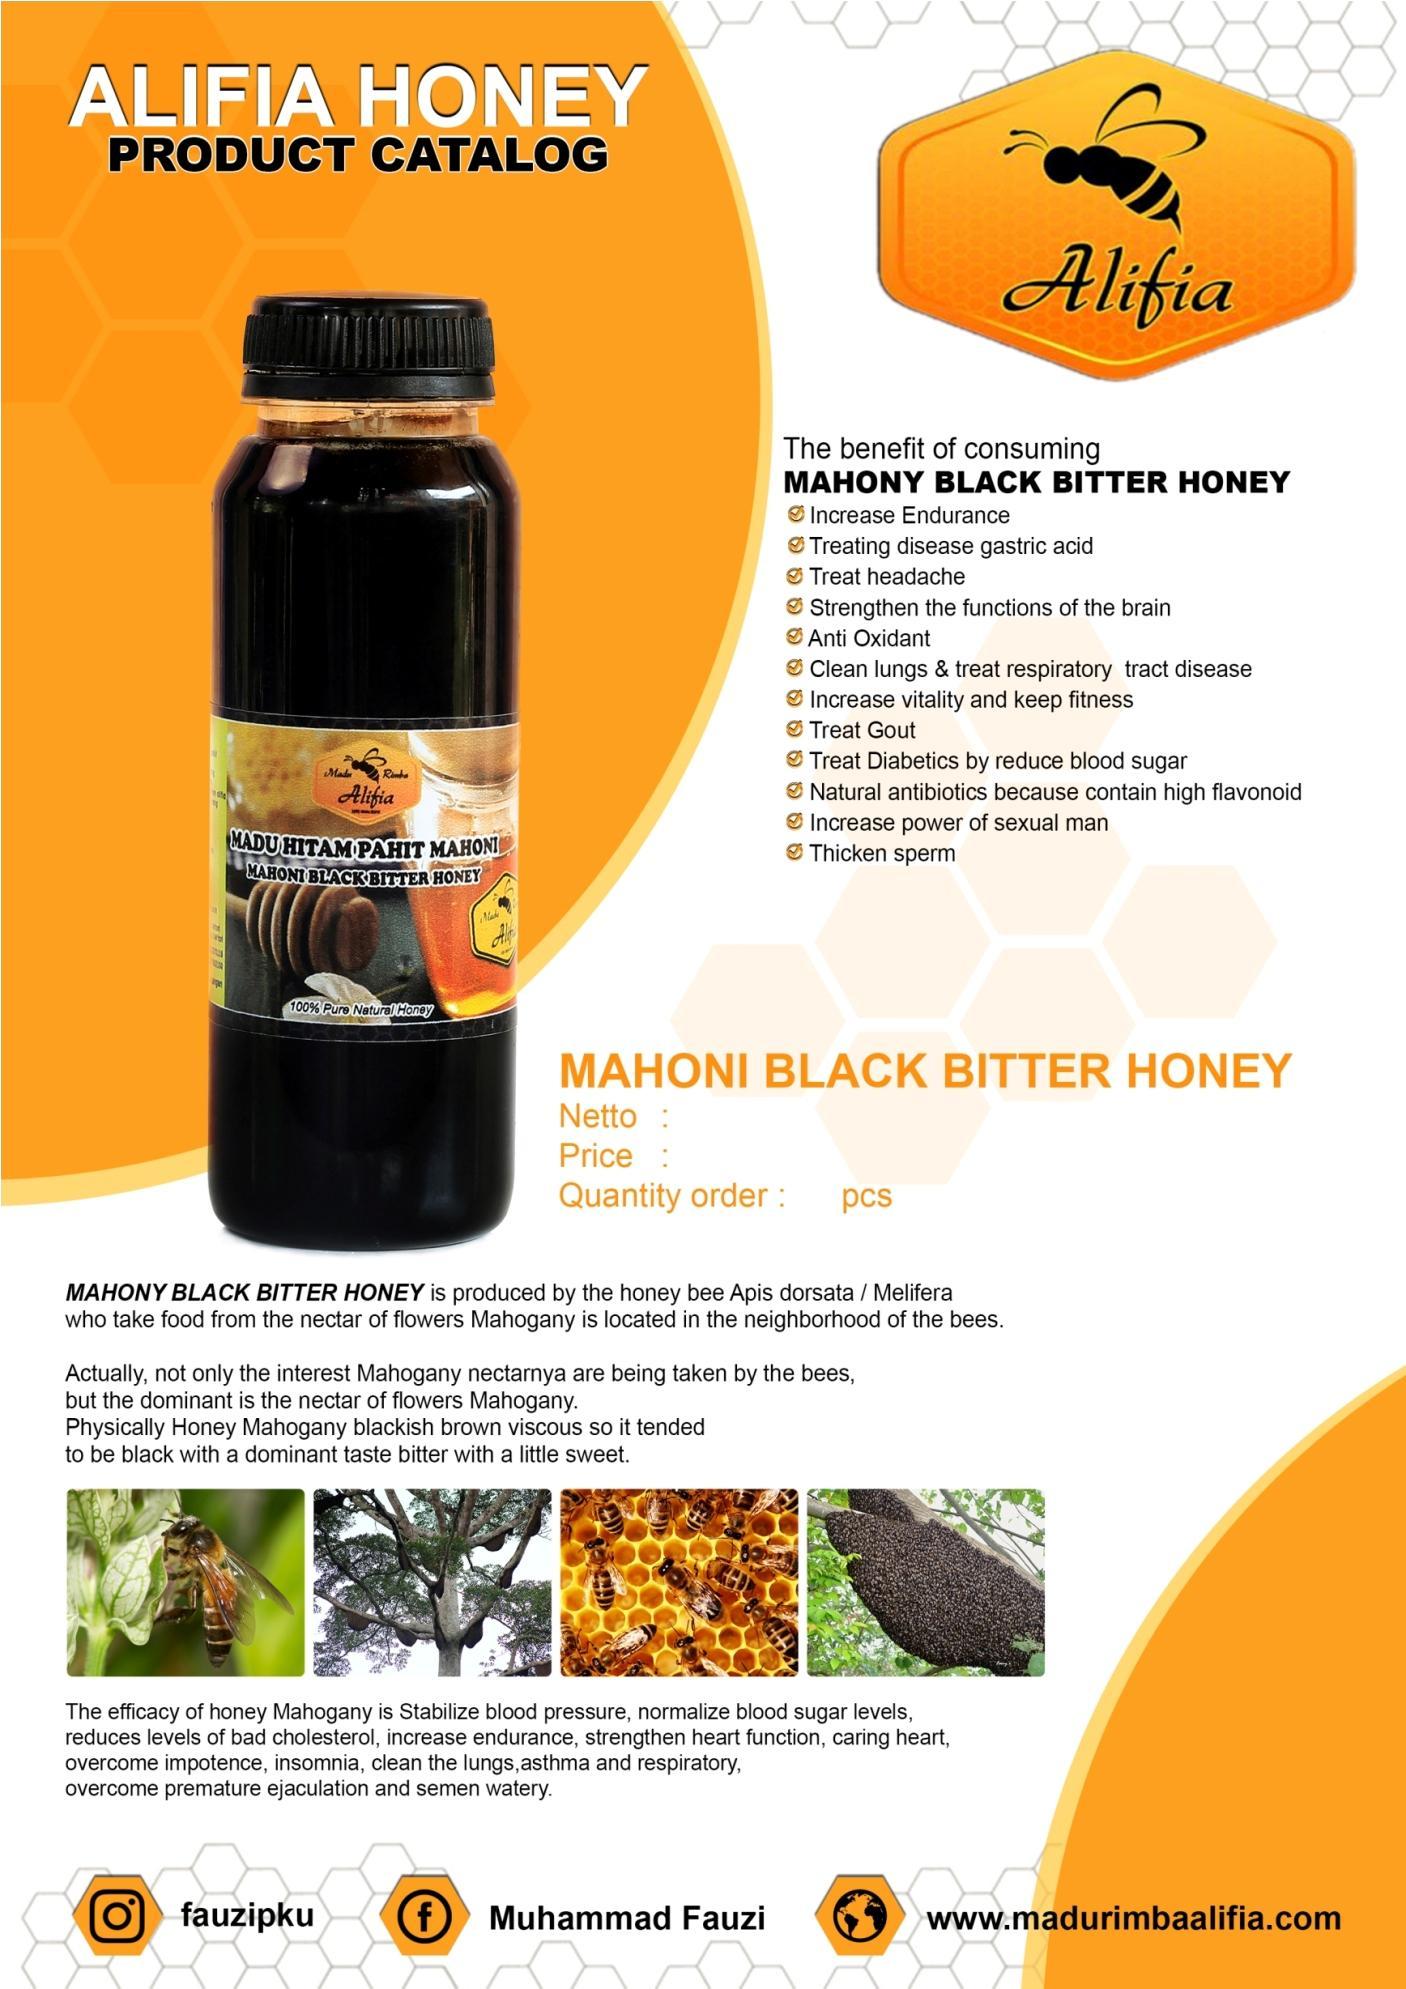 Madu Hitam Pahit Mahoni (Mahoni Black Bitter Honey)